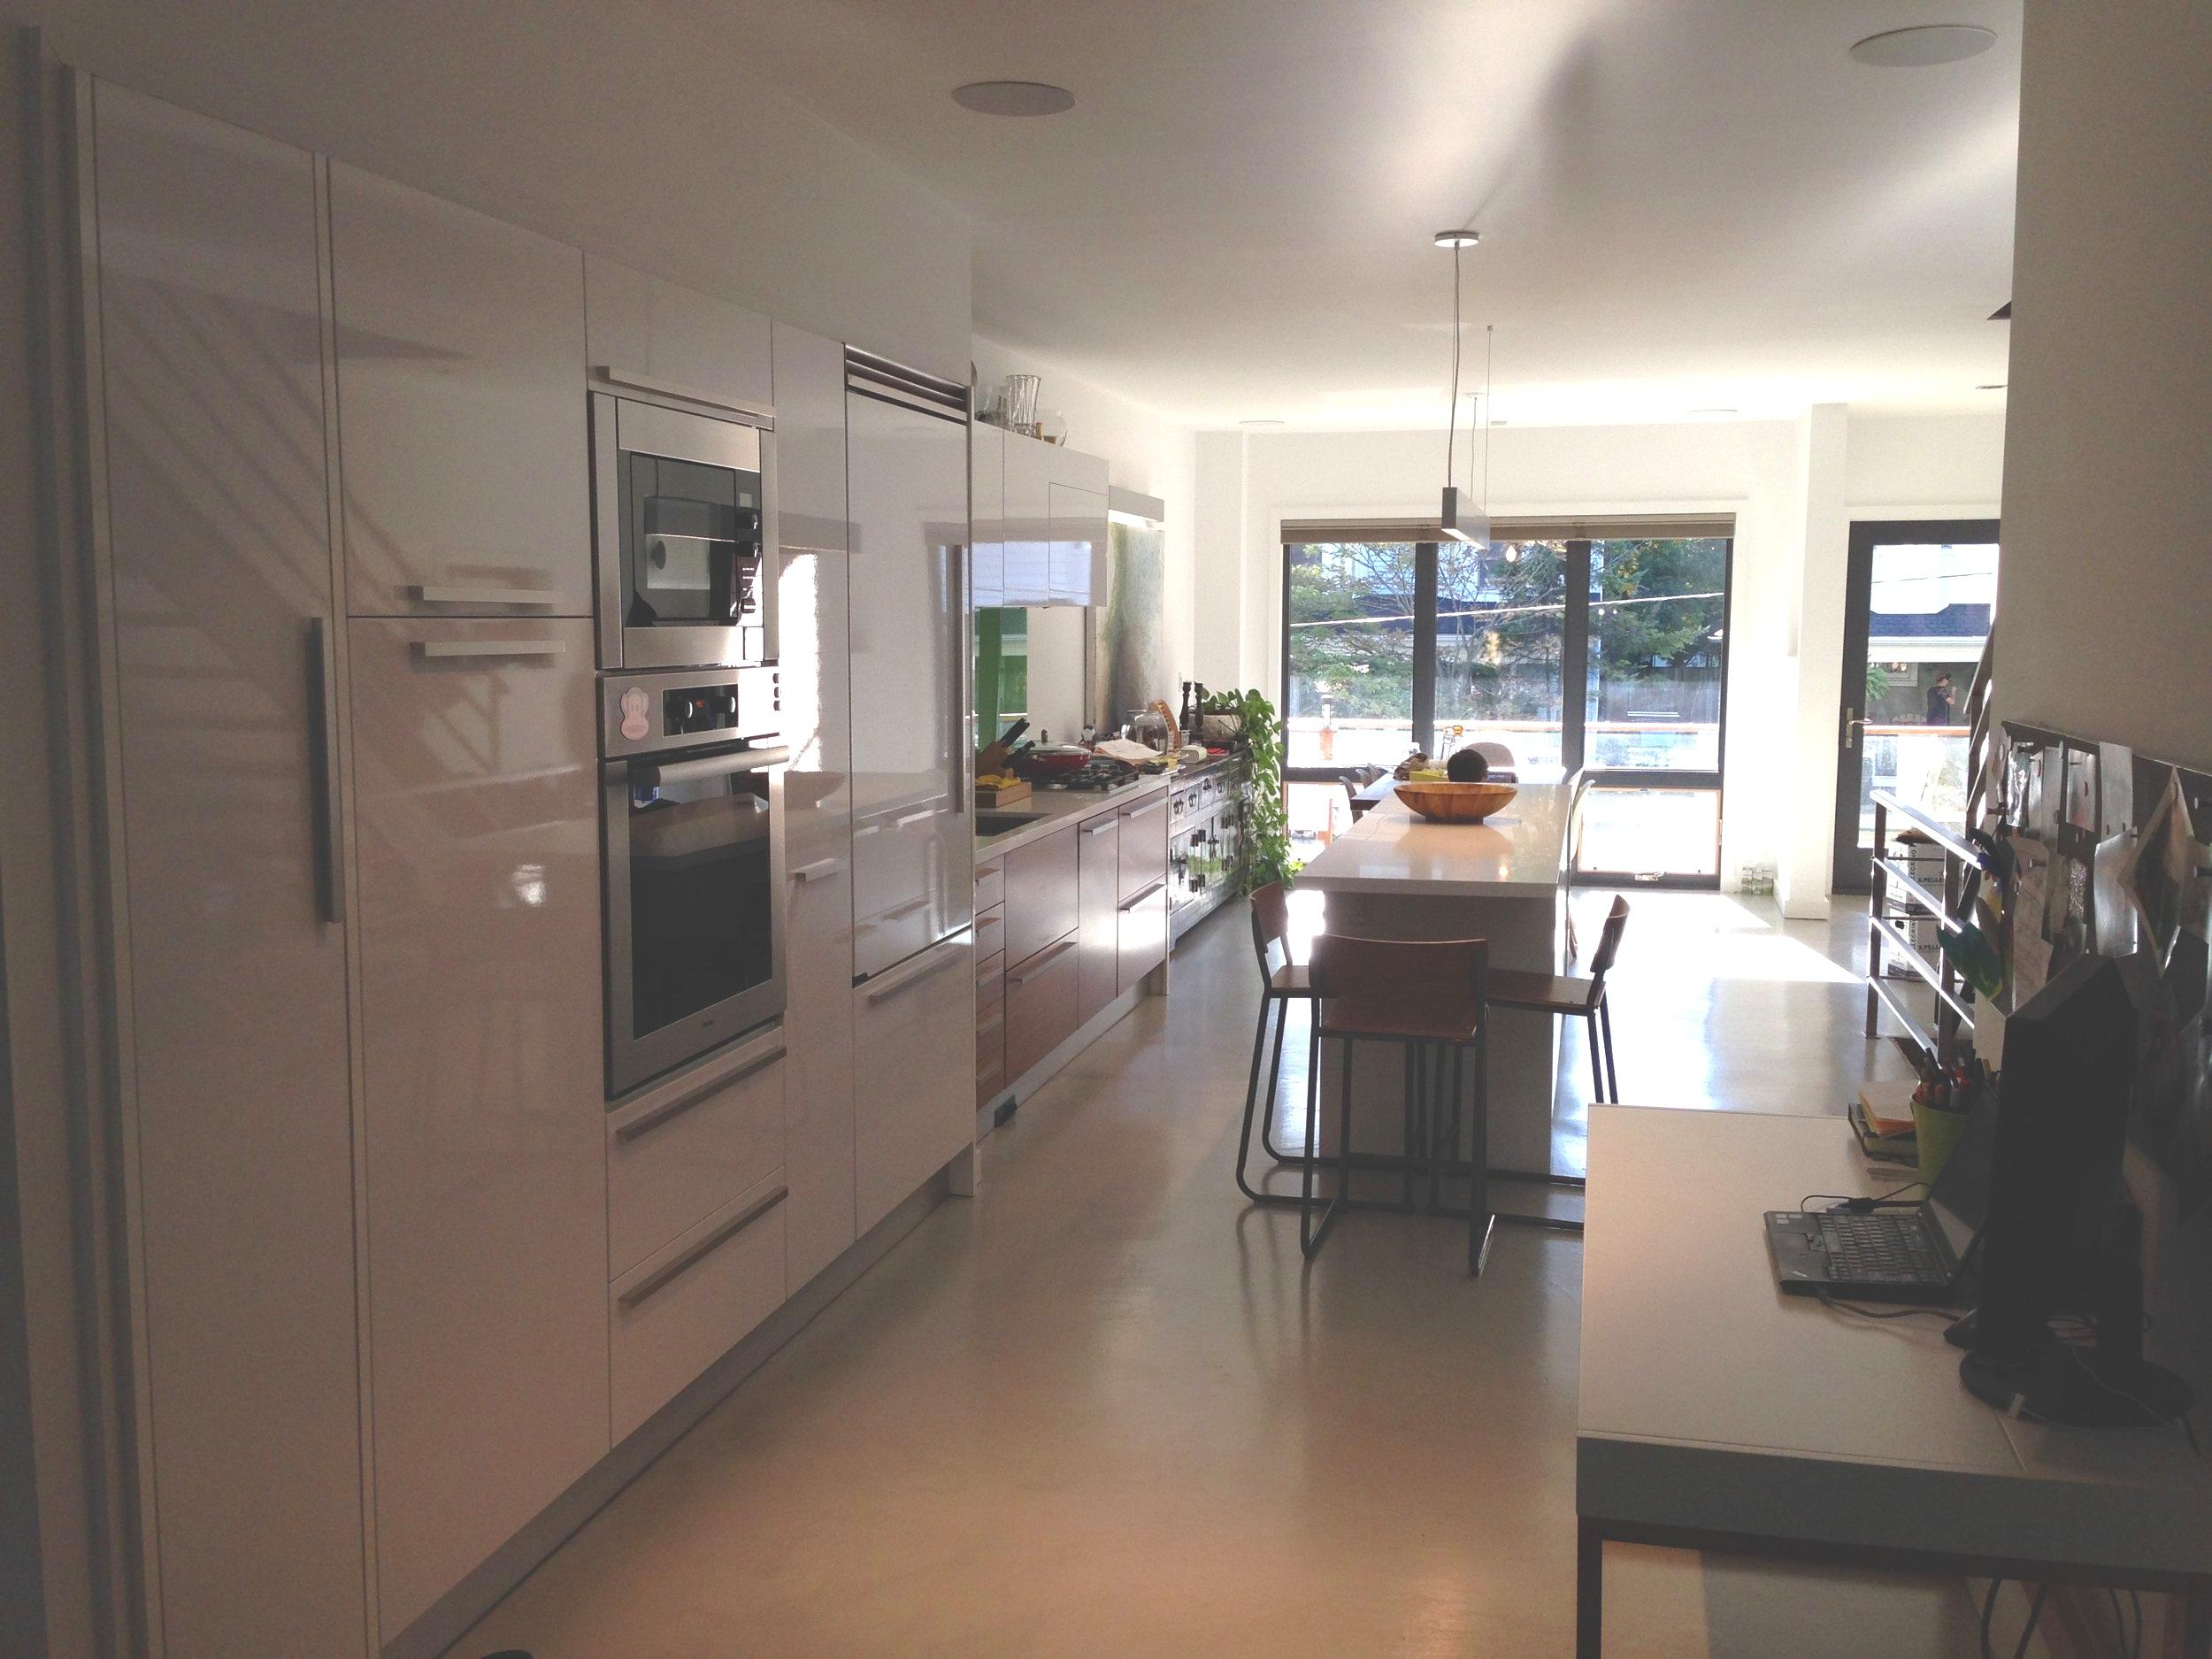 Kitchen 22 Pic 1.JPG